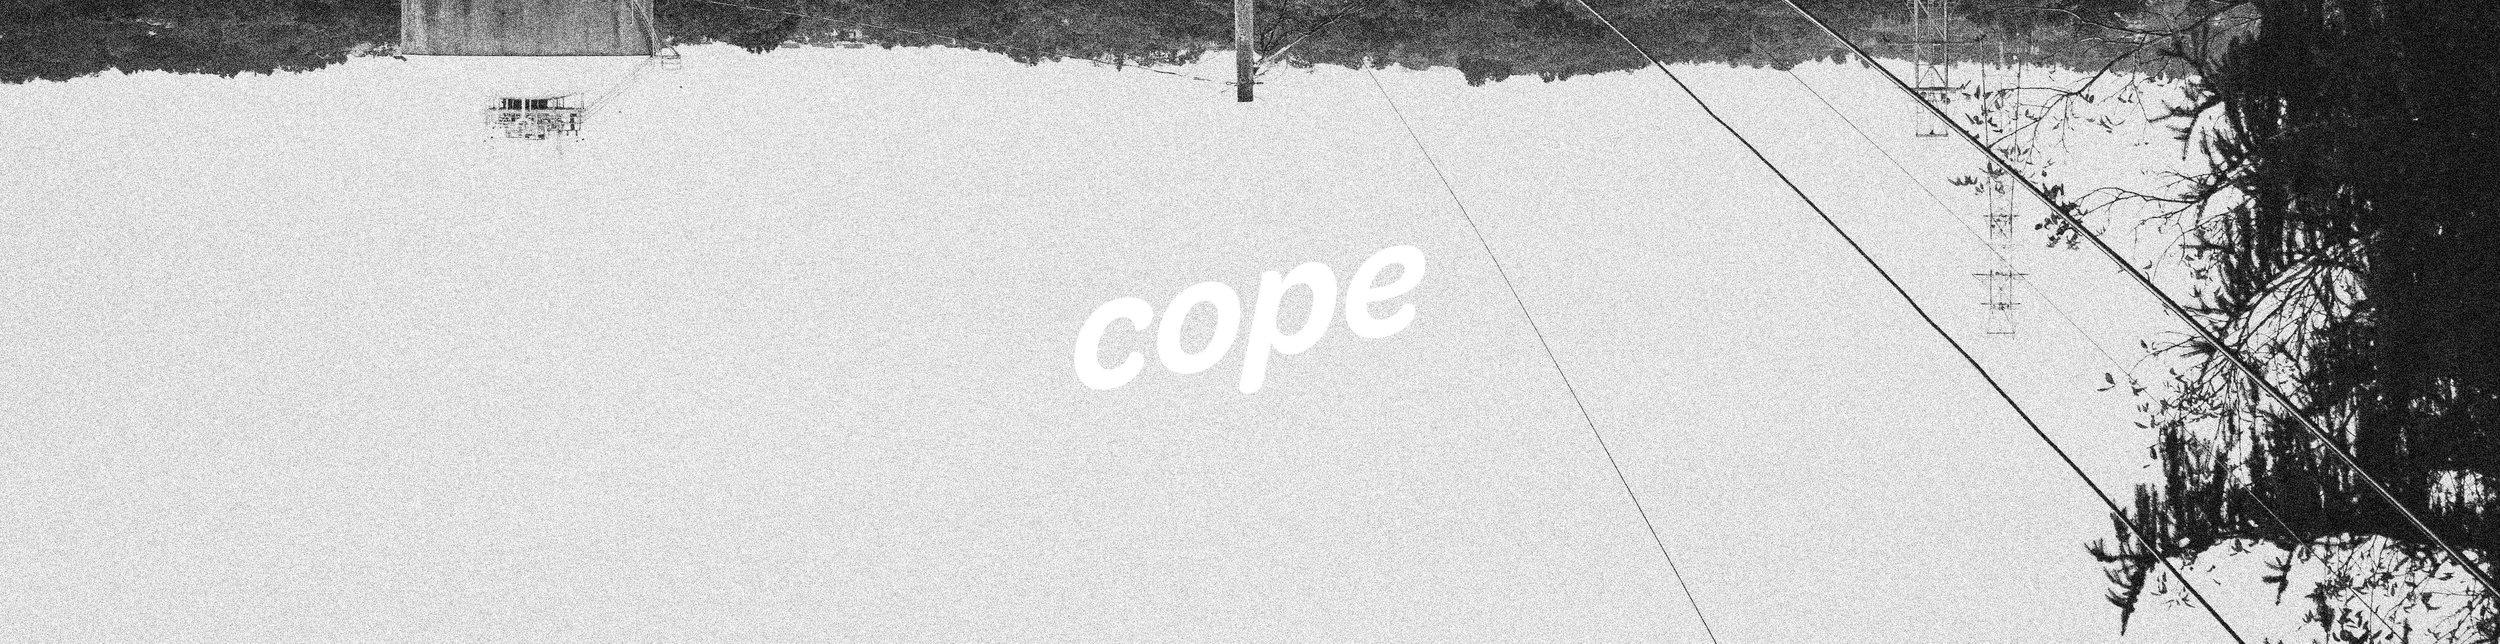 cope_Banner001.jpg